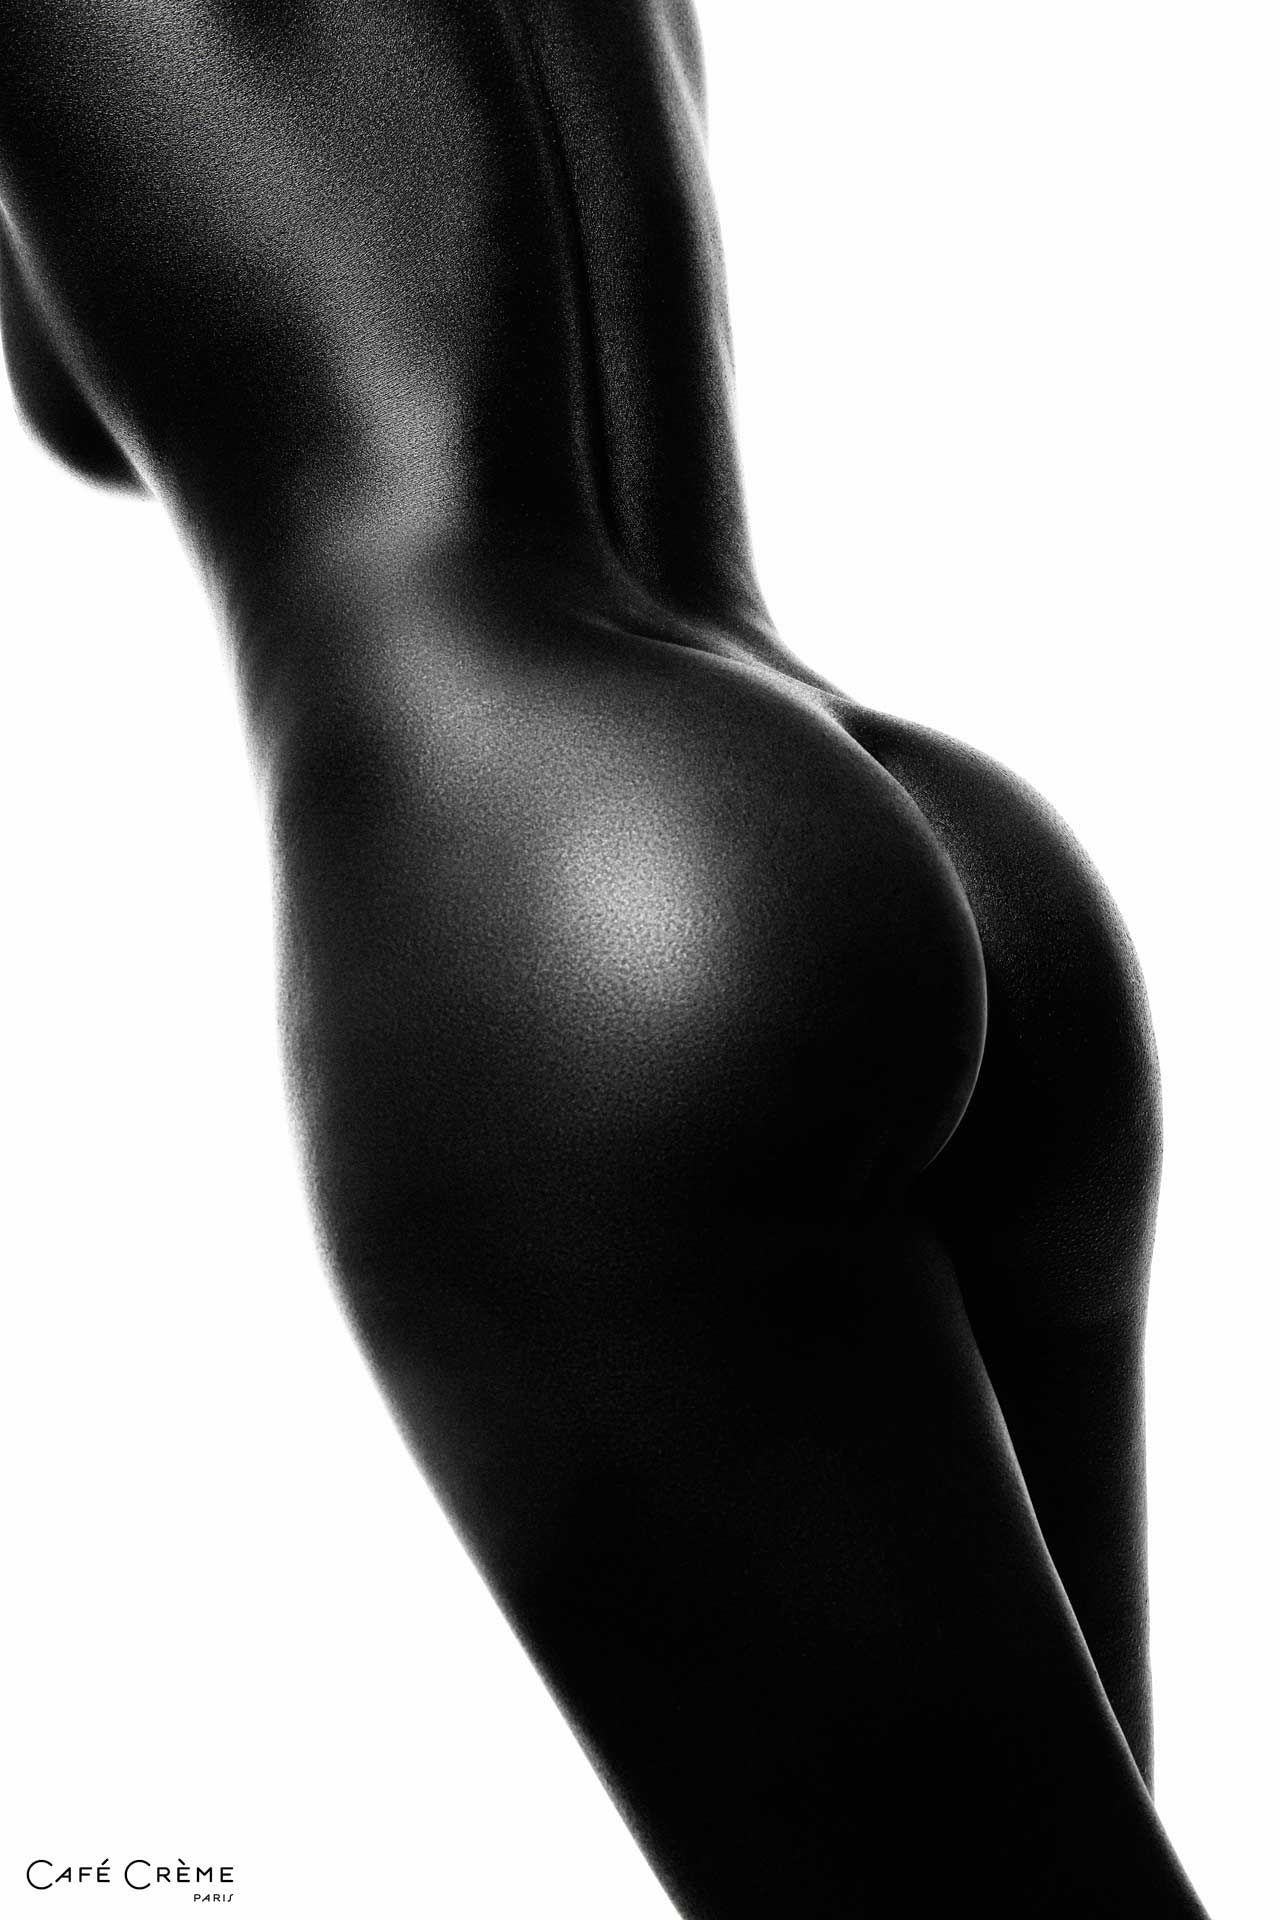 Non nude amateur big tits